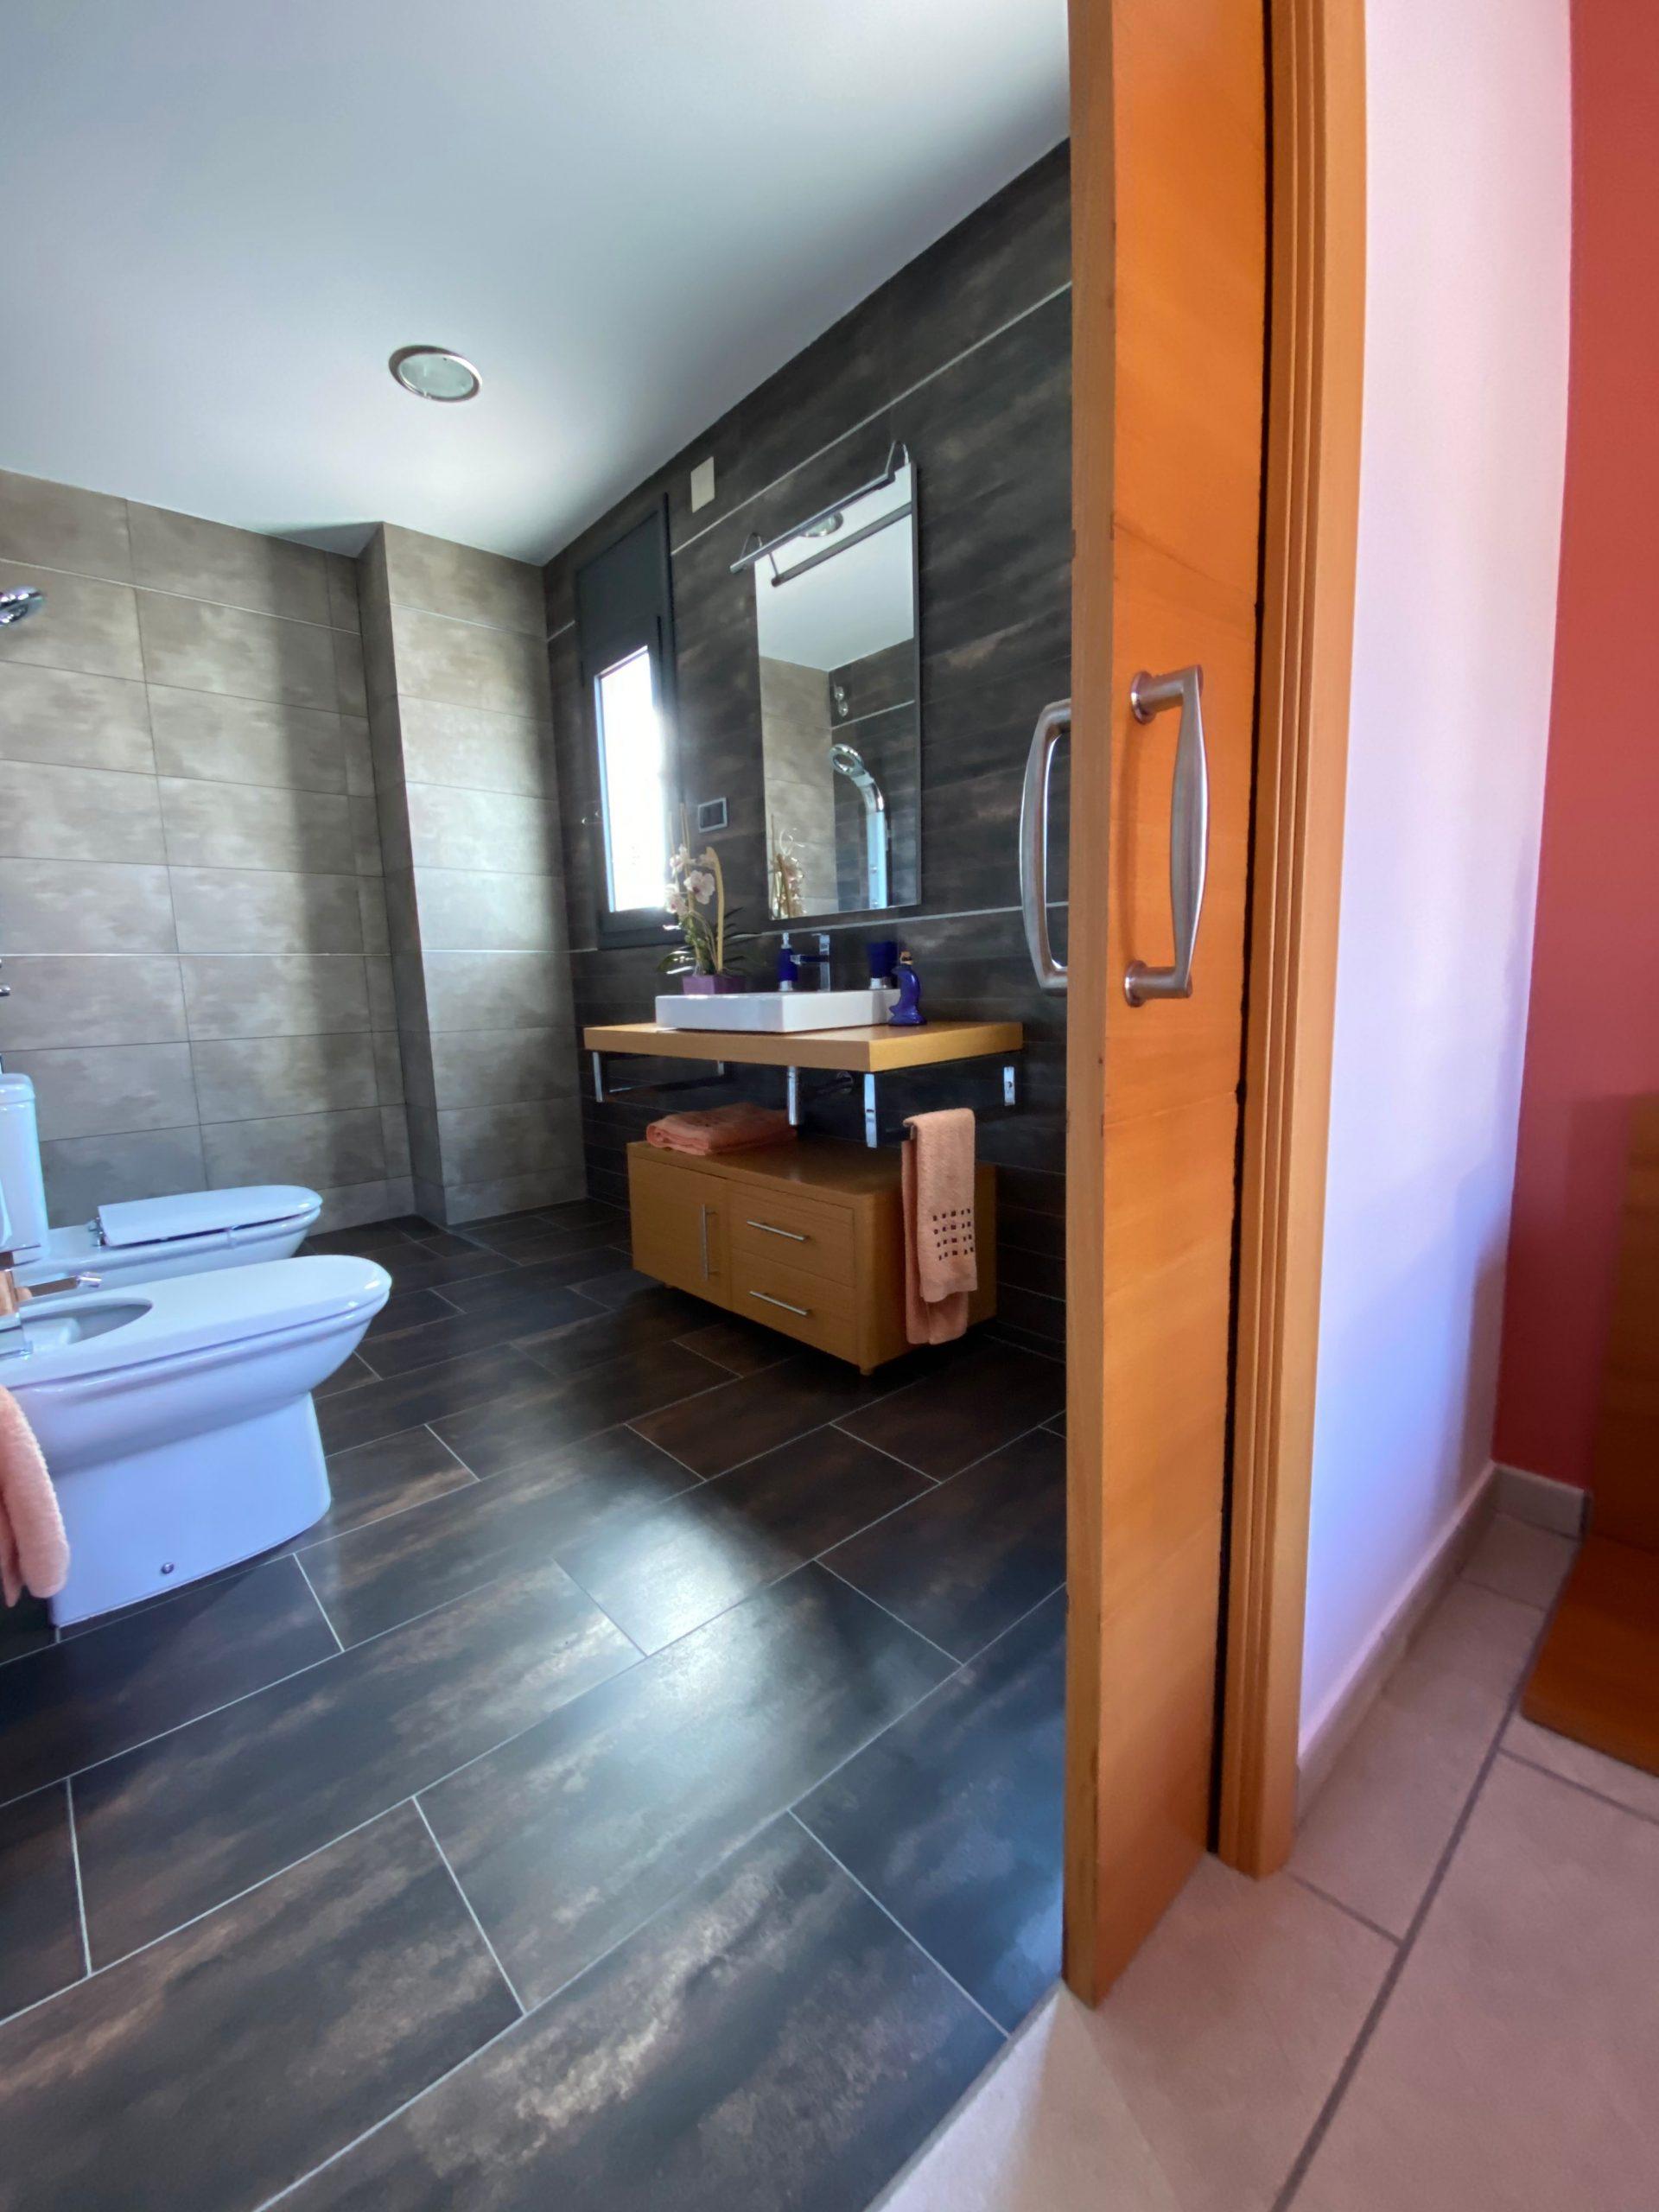 baño habitación invitados Pirineus 20 Les Faldes